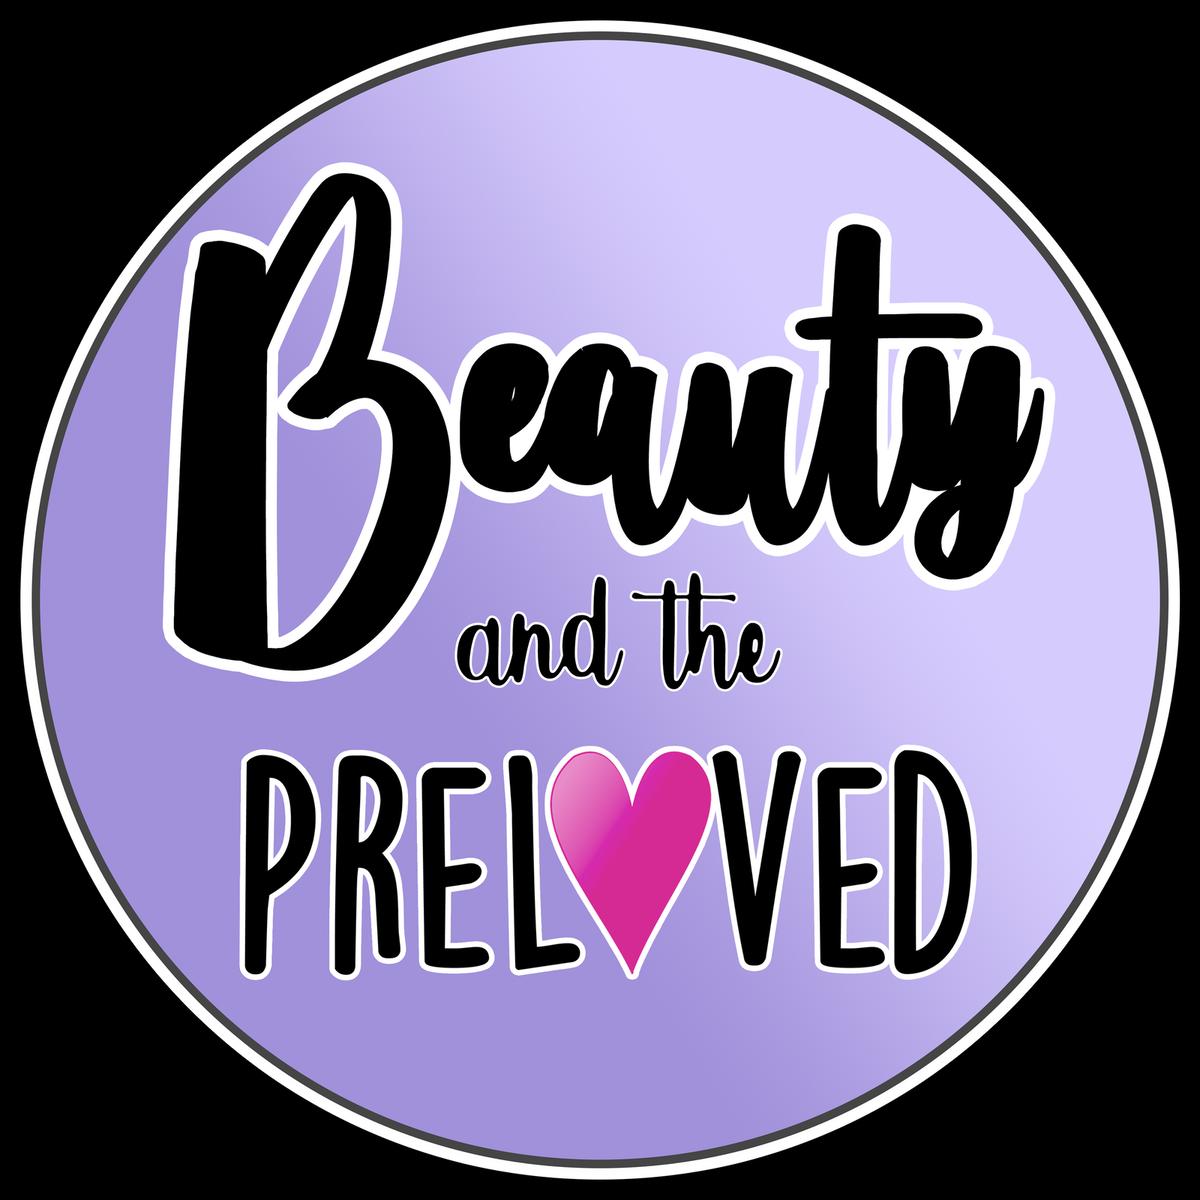 beautyandthepreloved